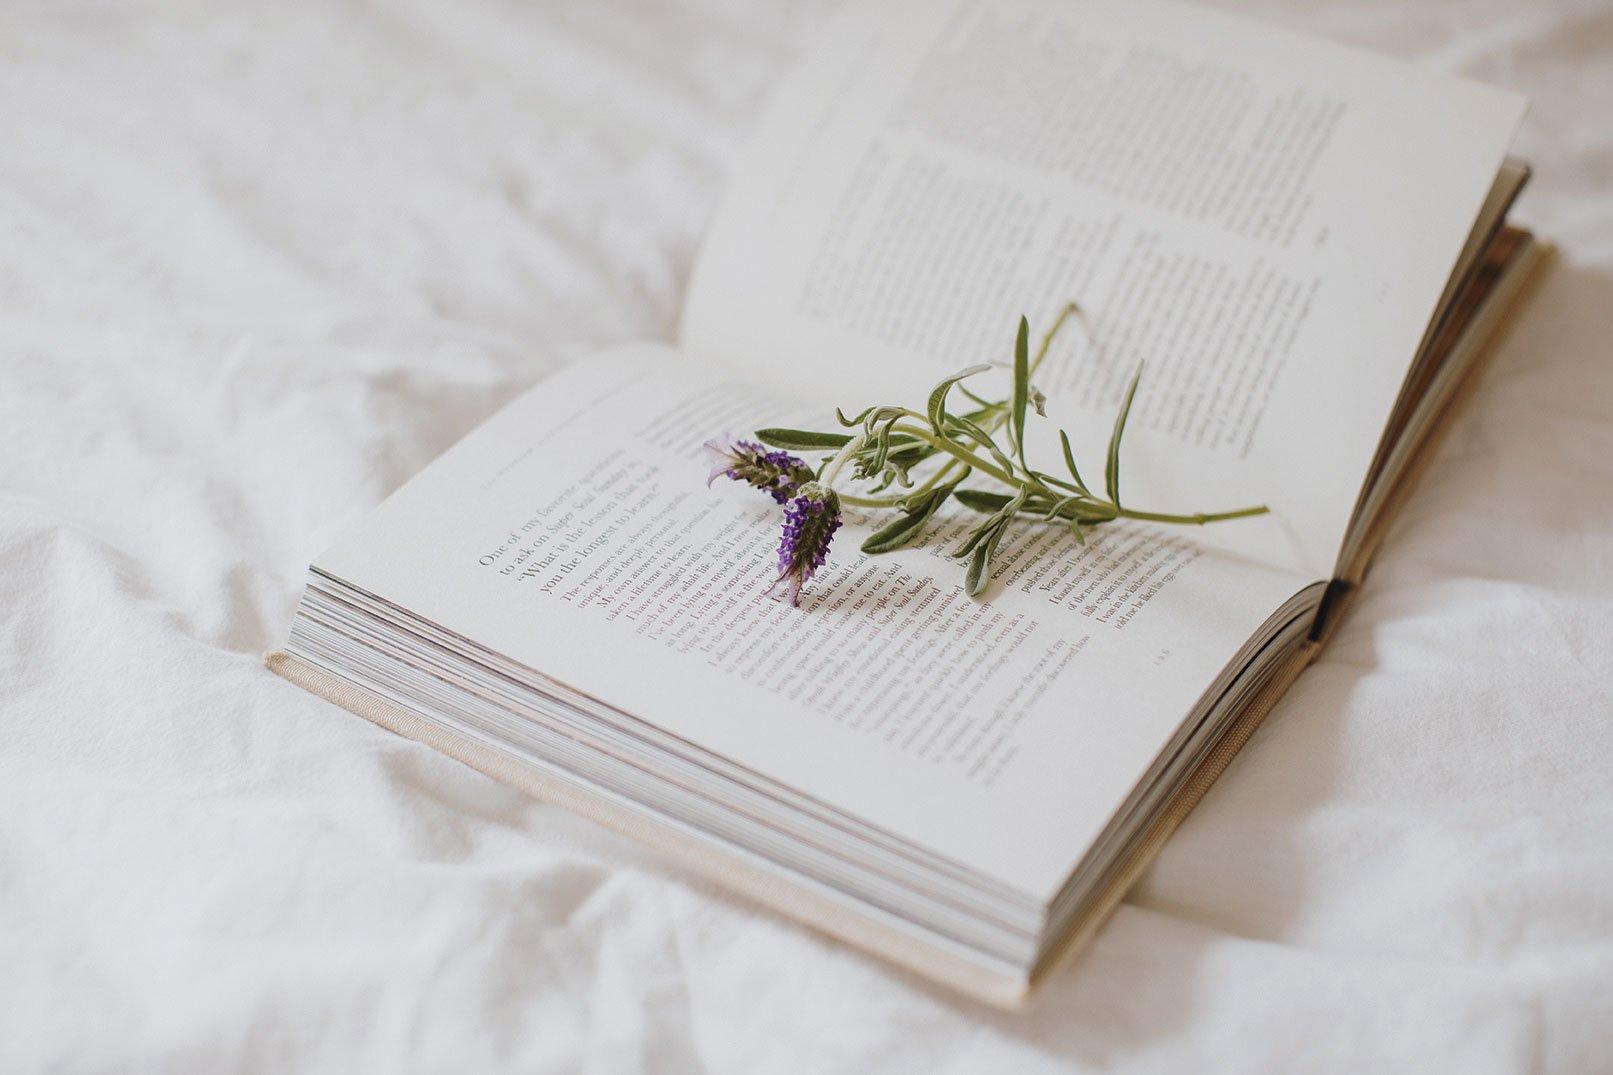 natalie gill native poppy lavender bedtime